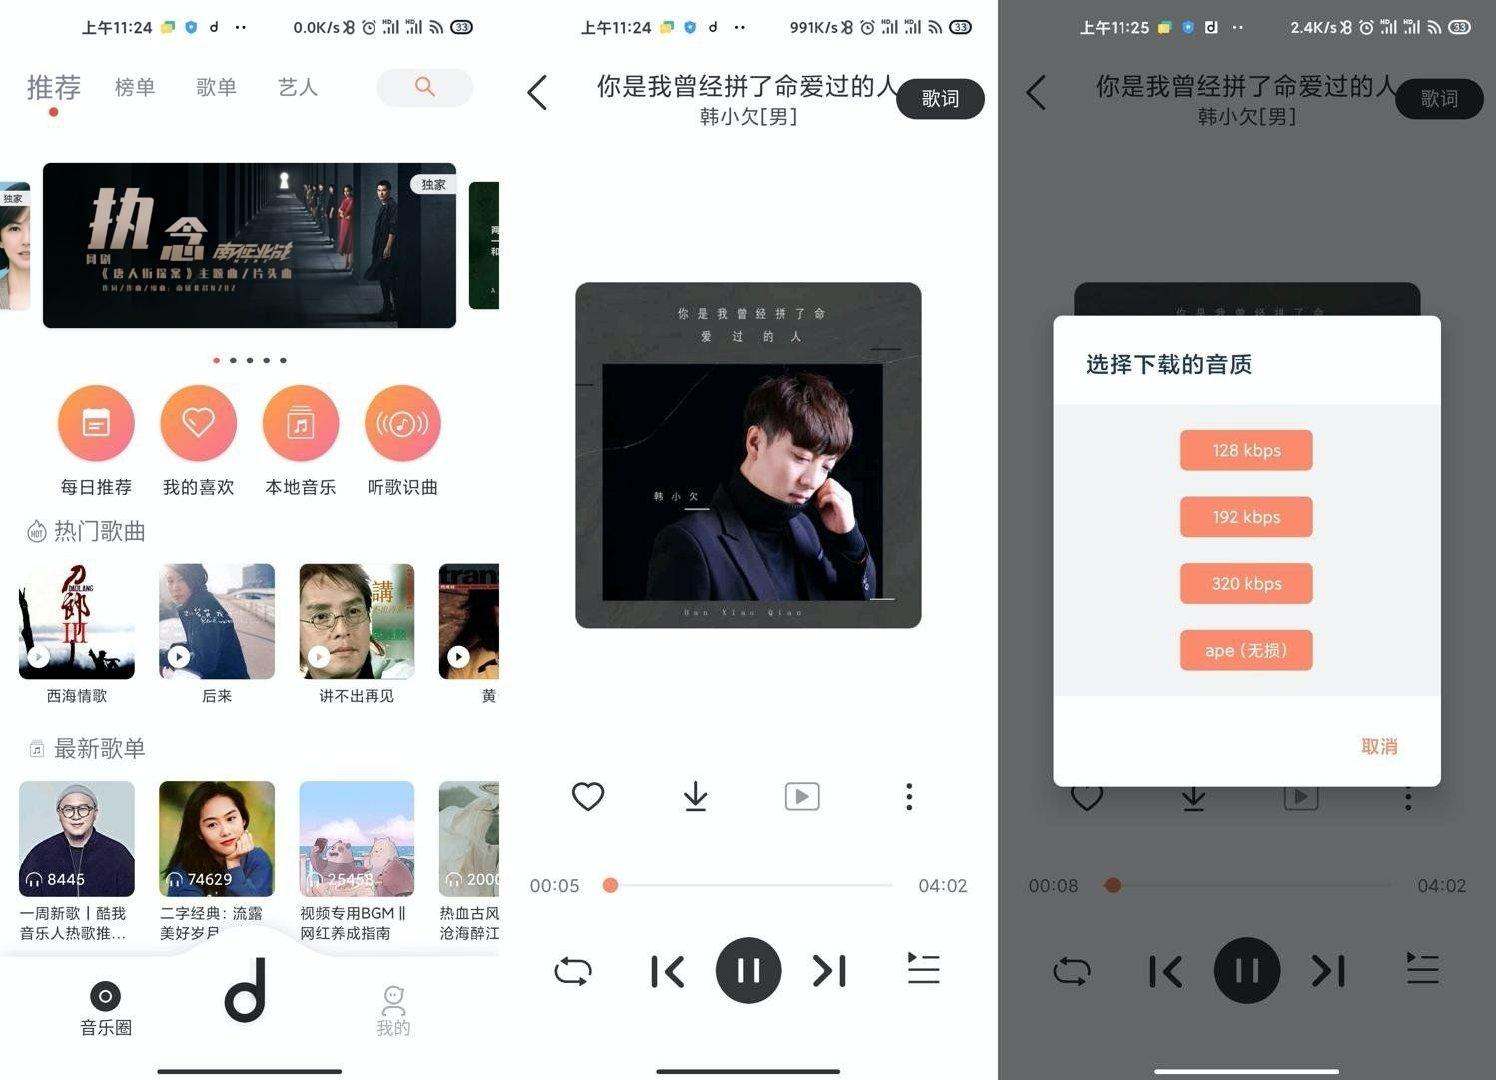 5f5cf7b33bd33 - Android & Windows - 免费音乐播放器魔音Morin安卓版1.5.2+电脑端